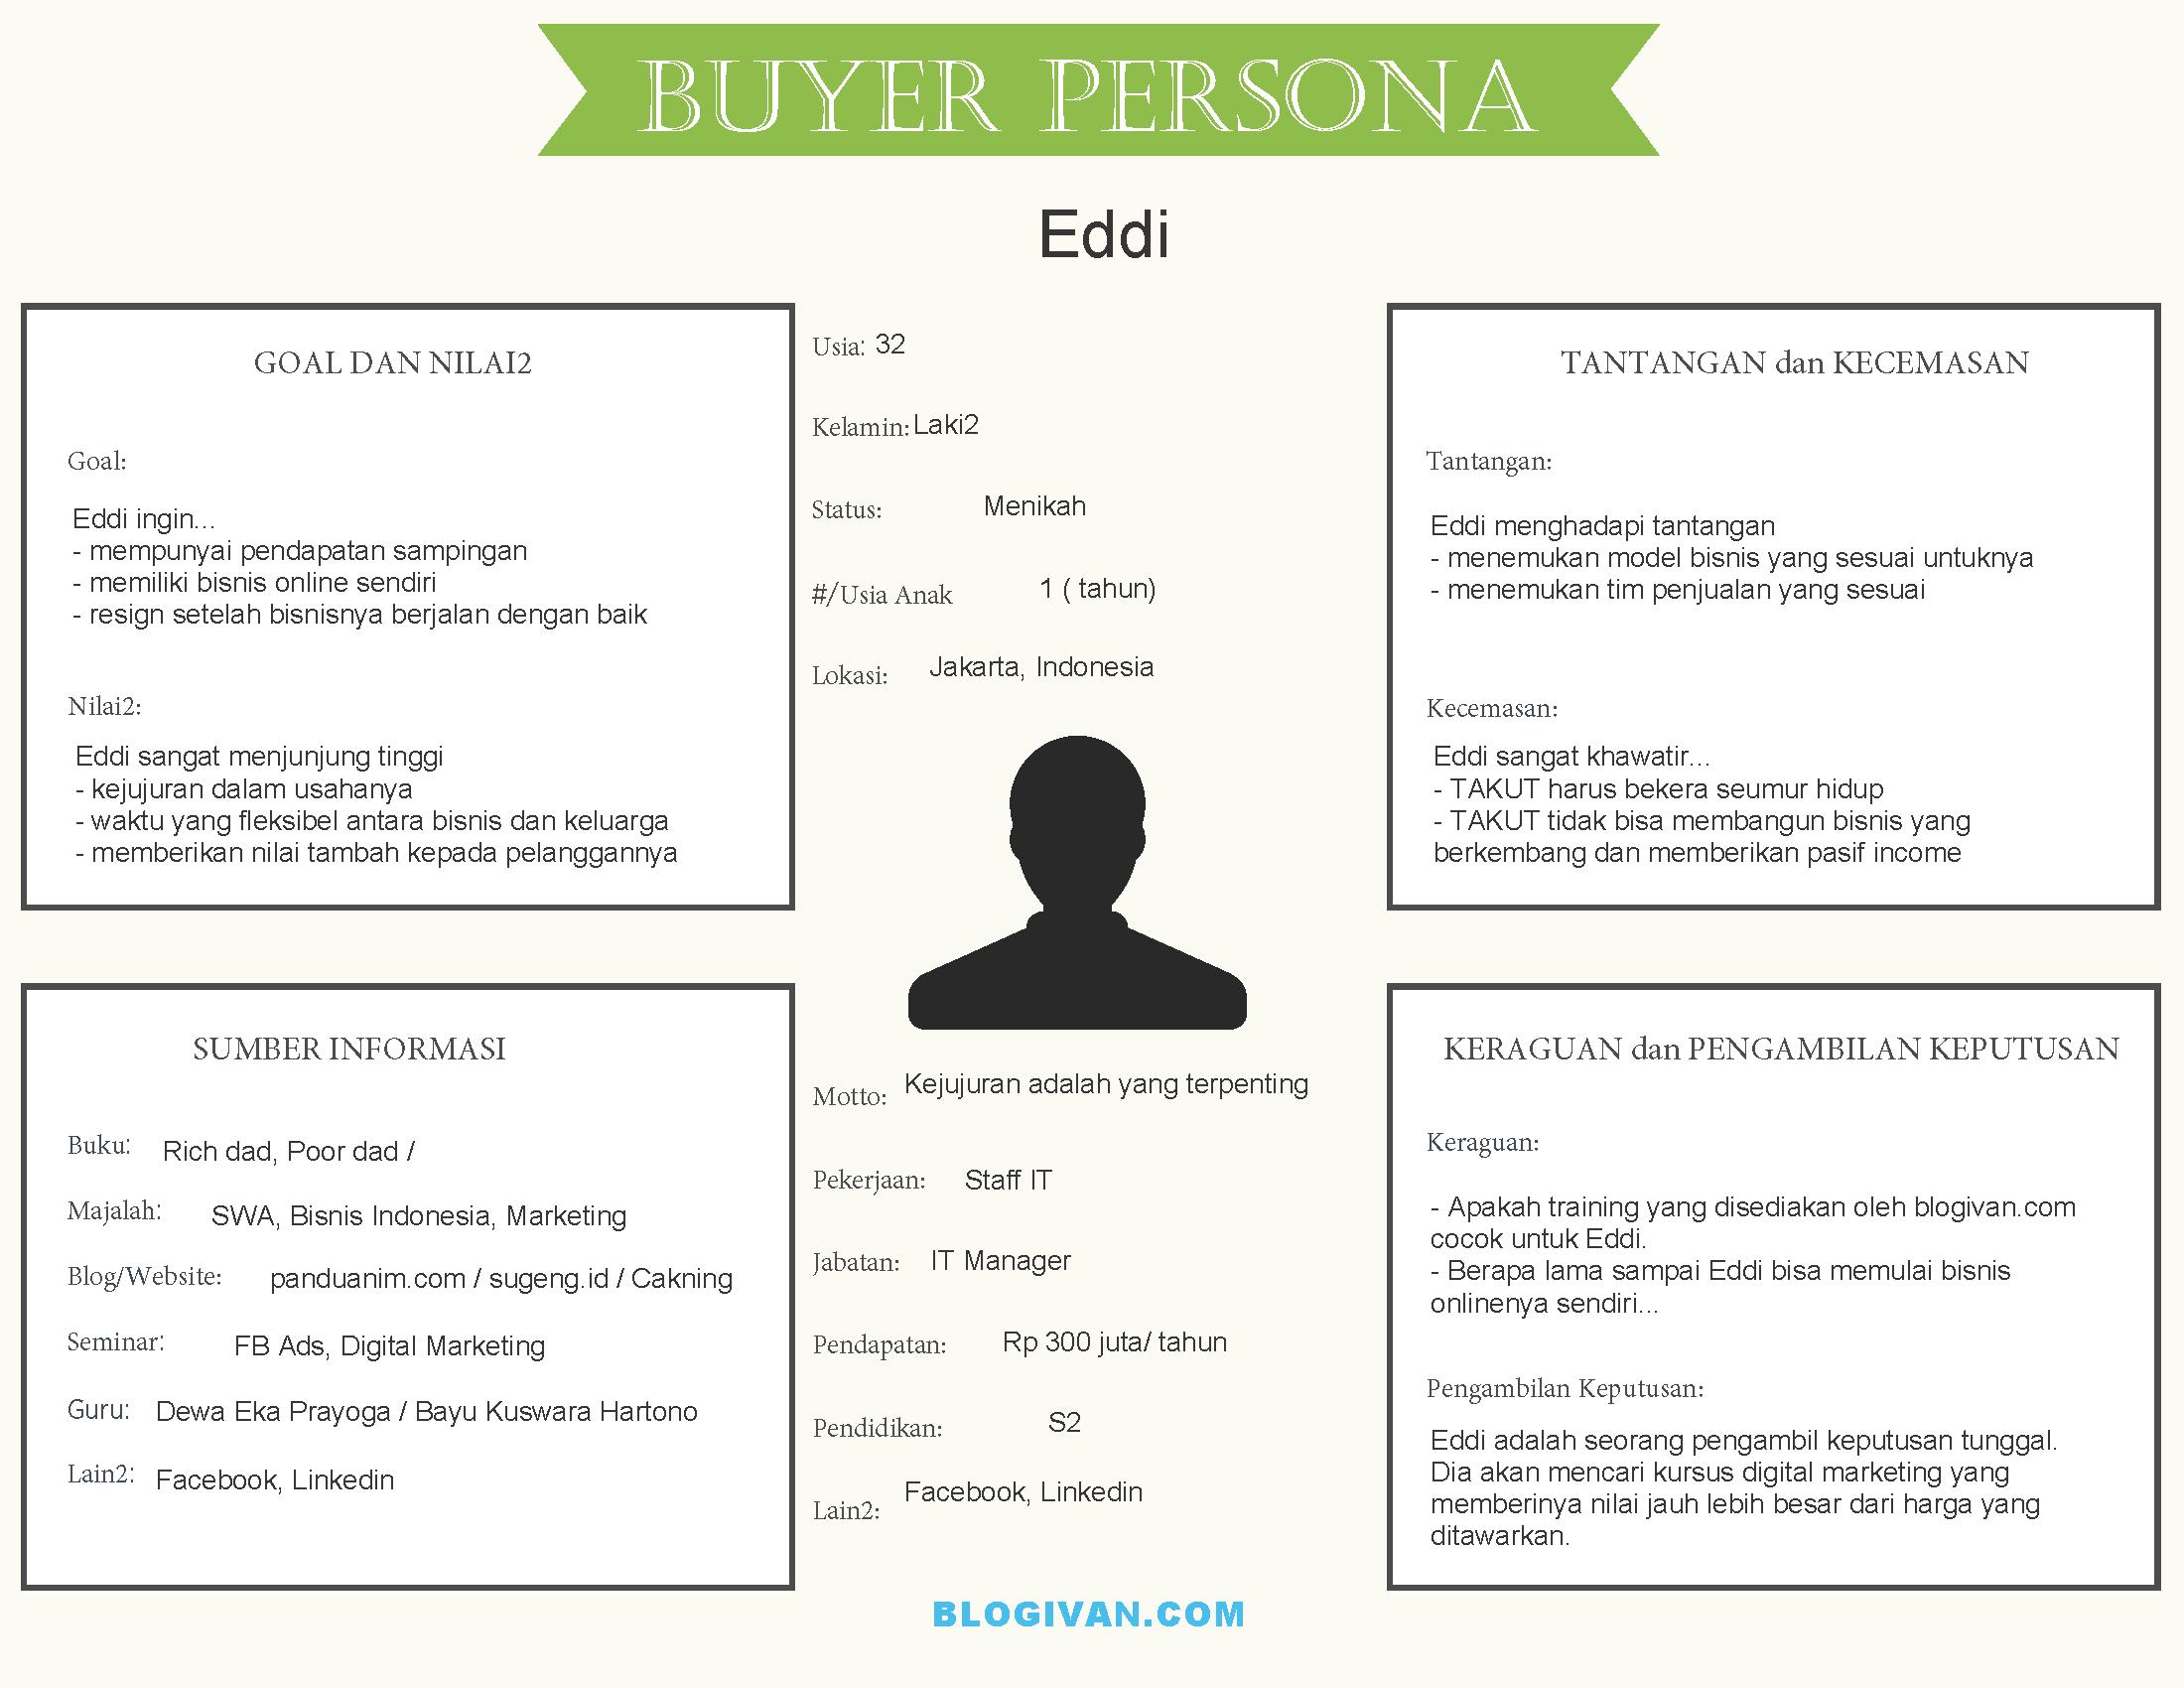 contoh buyer persona